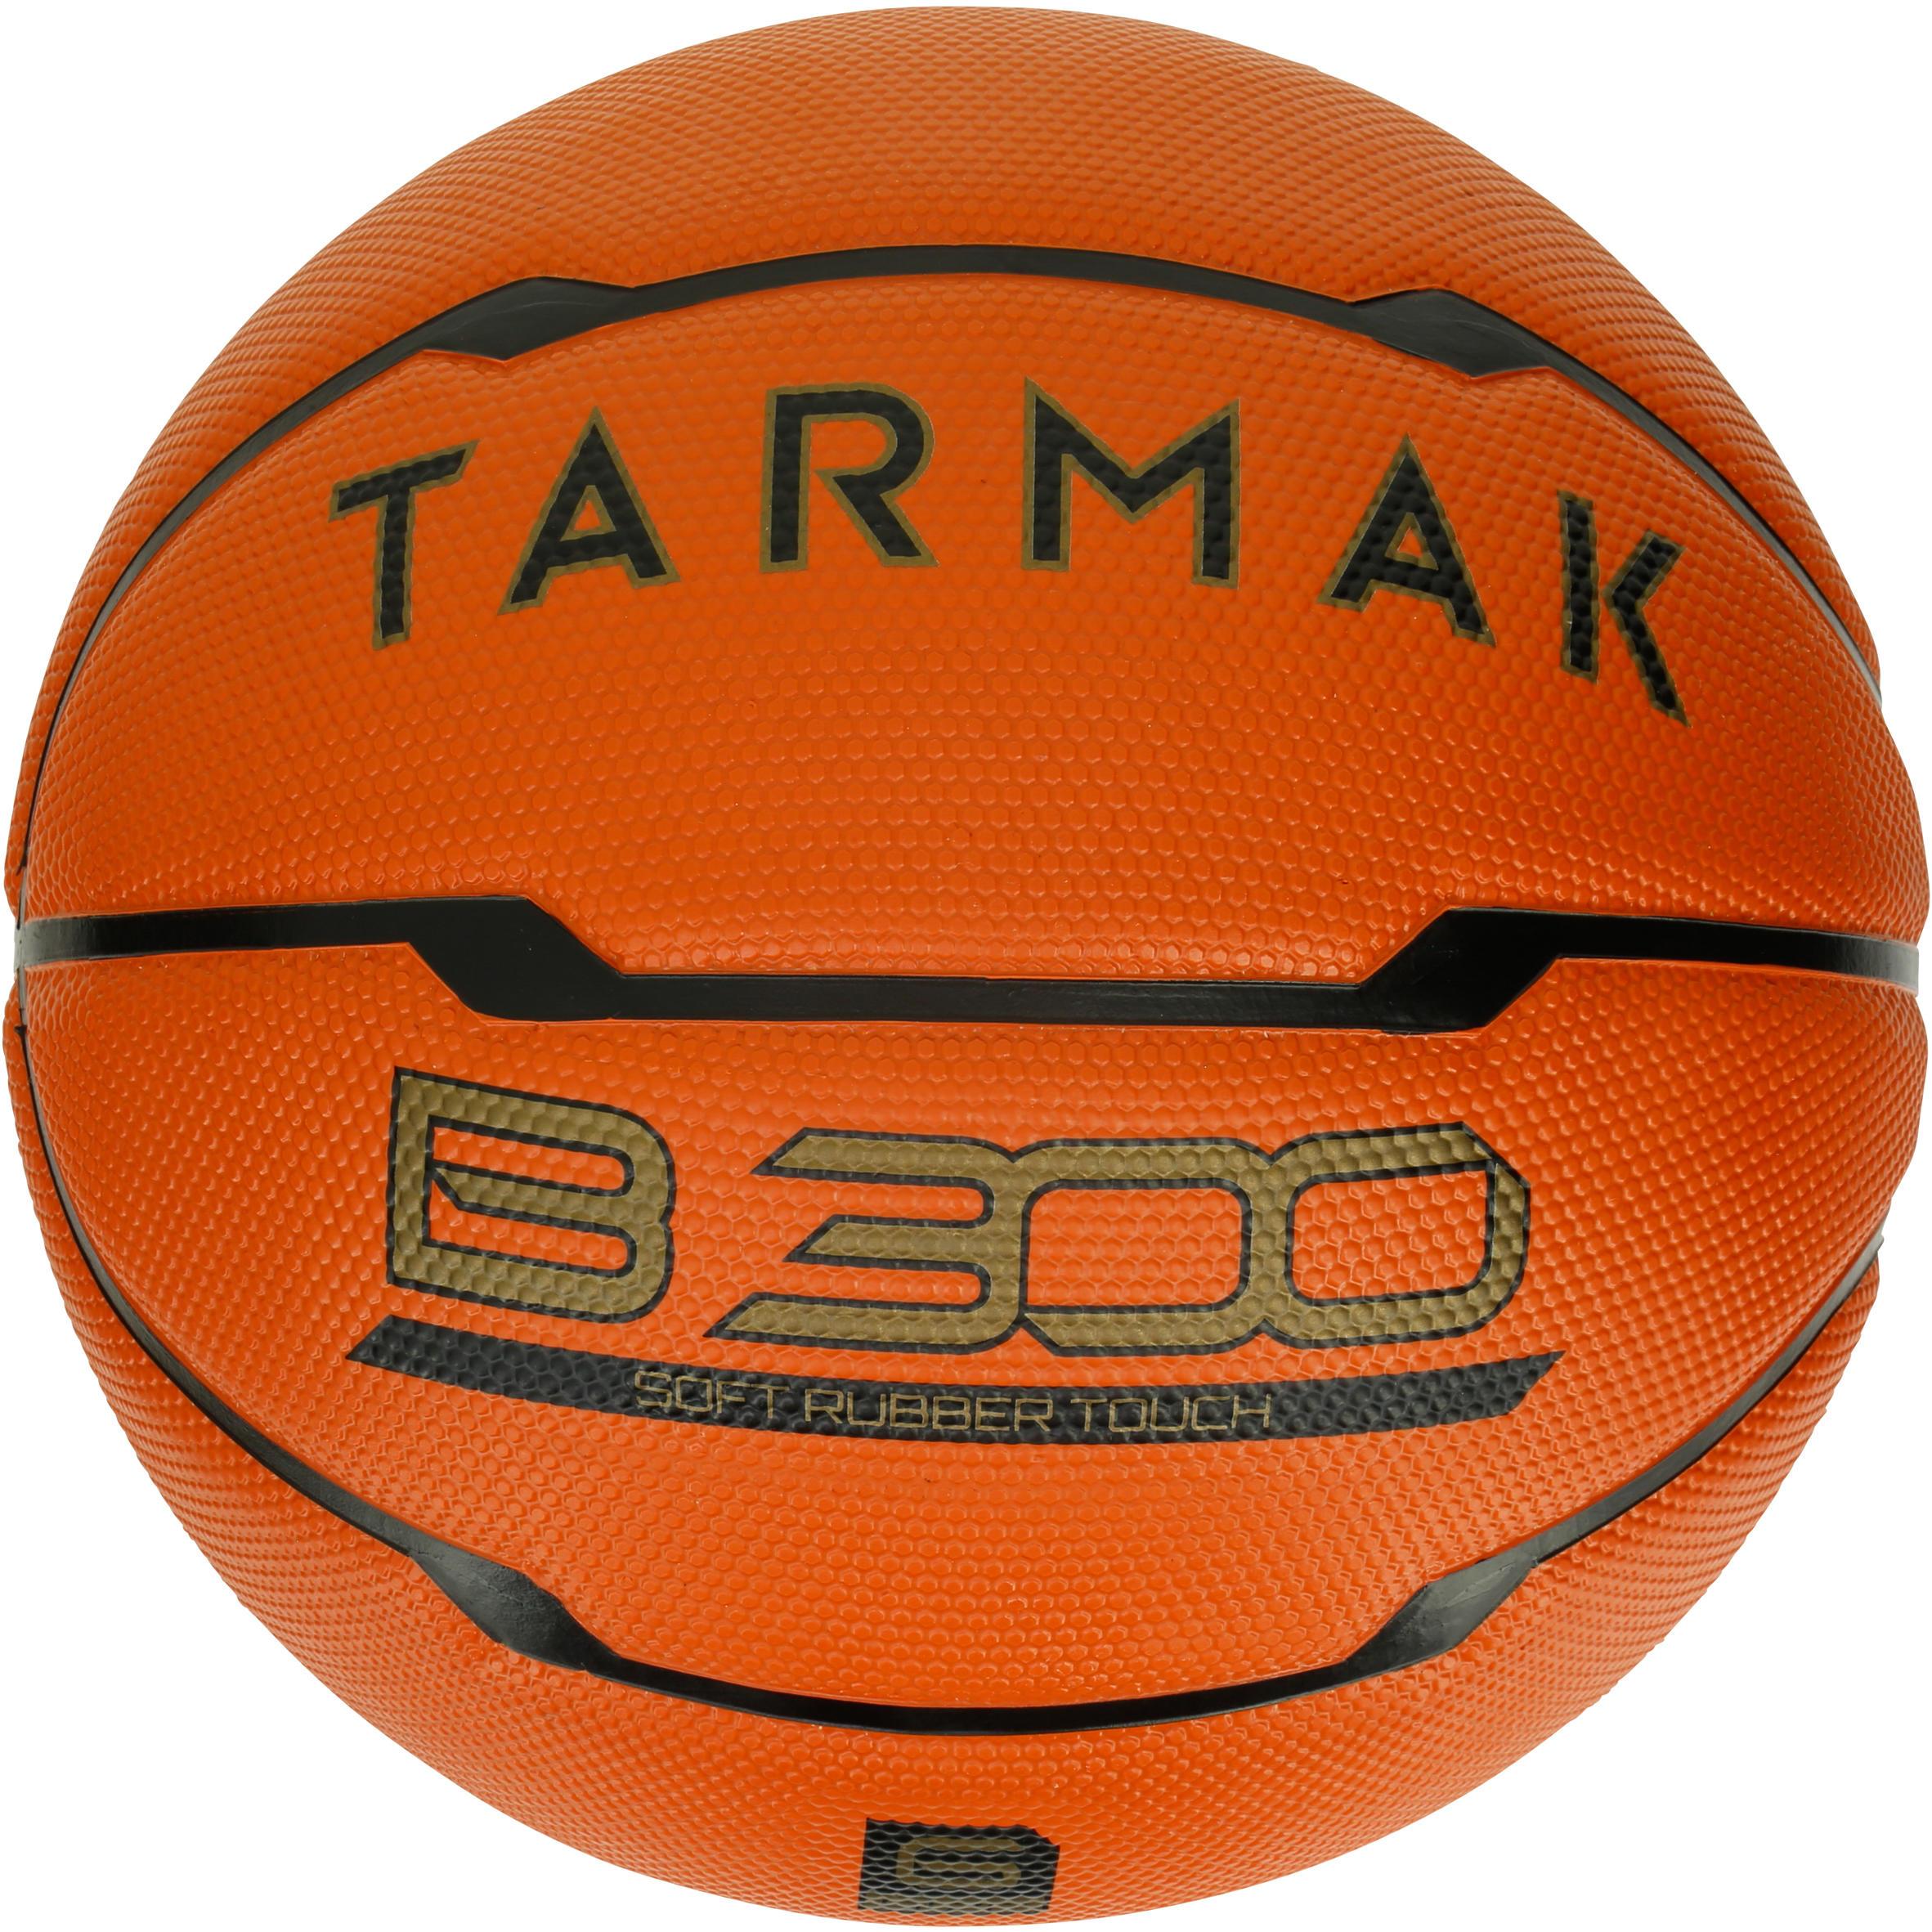 Tarmak Basketbal B300 maat 6 dames oranje. Voor beginners. Vanaf 10 jaar.